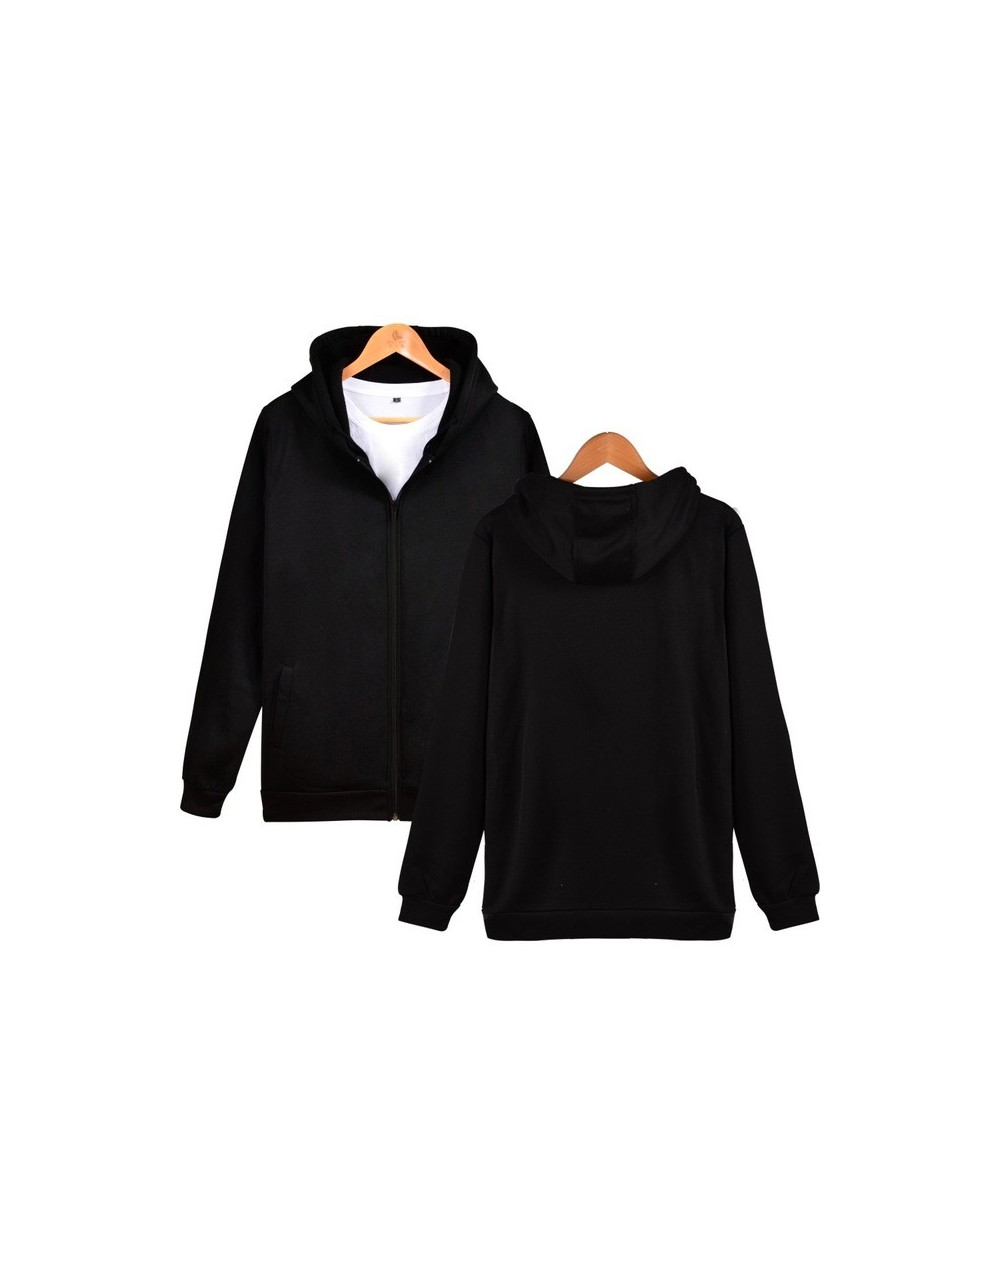 Winter Solid Color Hooded Sweatshirts Boy Zipper Hoodies Fashion Funny Coat Casual Hoodies Boy Hip Hop 4XL Clothes - Black -...